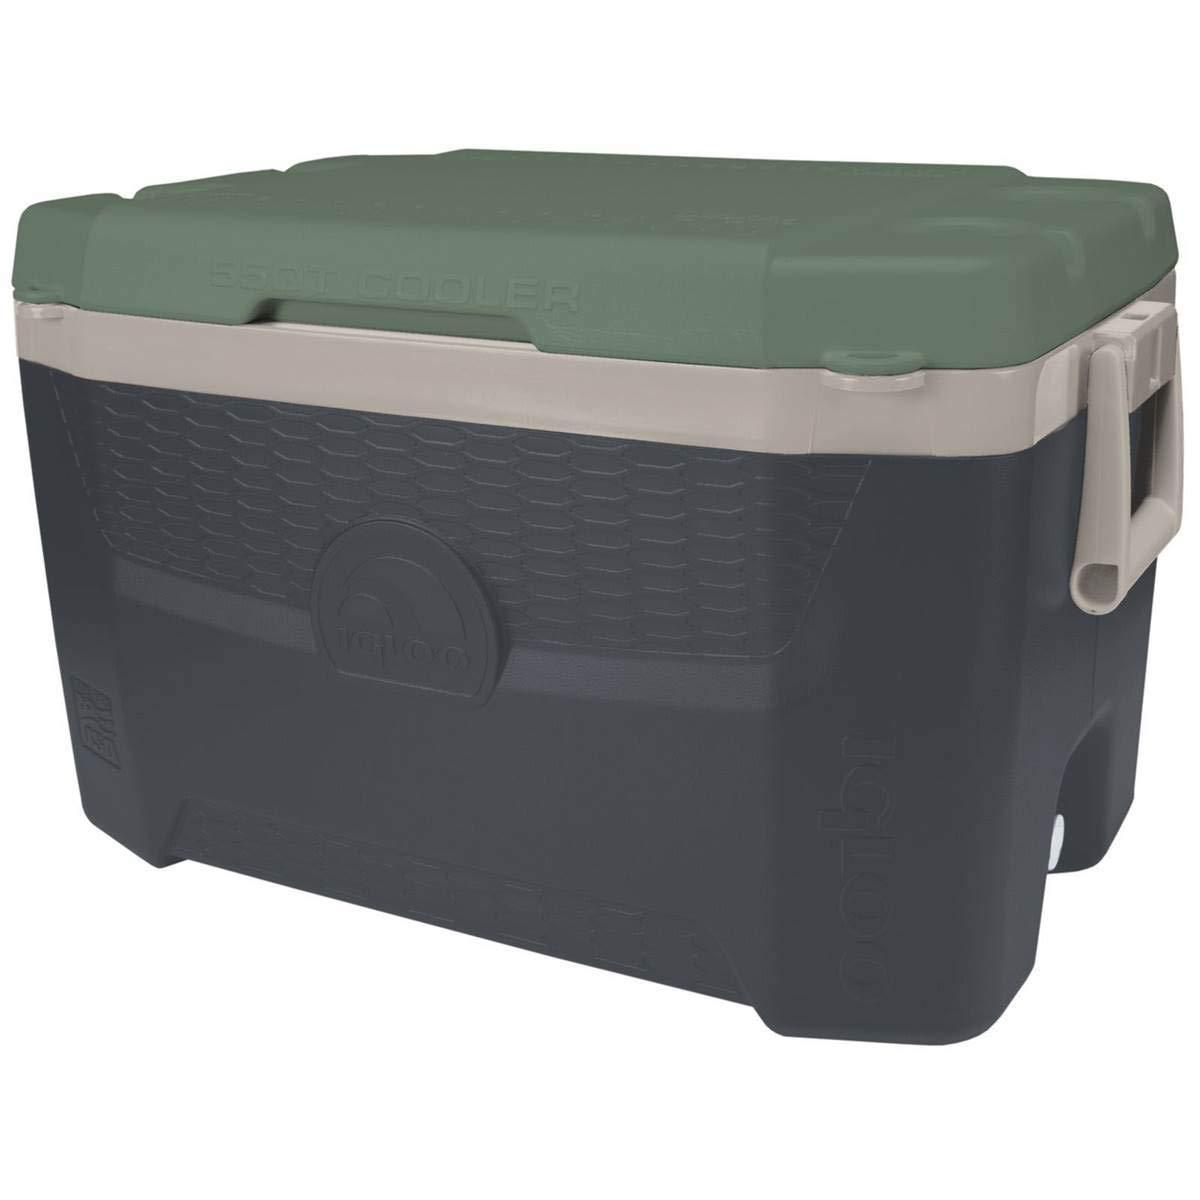 Igloo - Corporation 55 Quarts Ultratherm Sportsman Cooler, Huntergreen